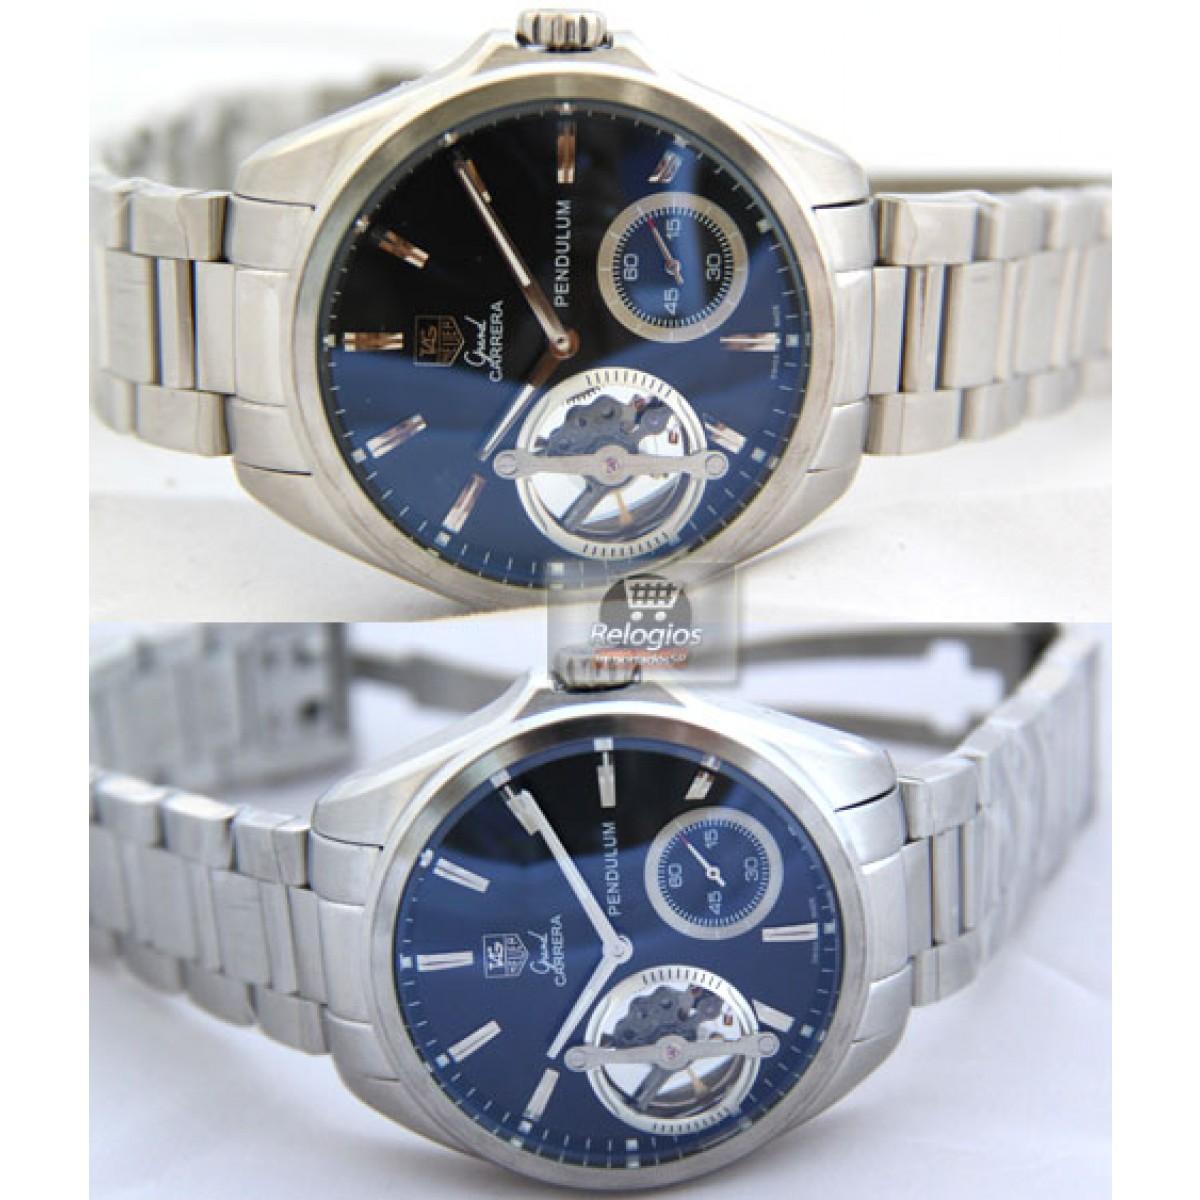 2b3571974d5 Relógio Réplica Tag Heuer Grand Carrera Pendulum